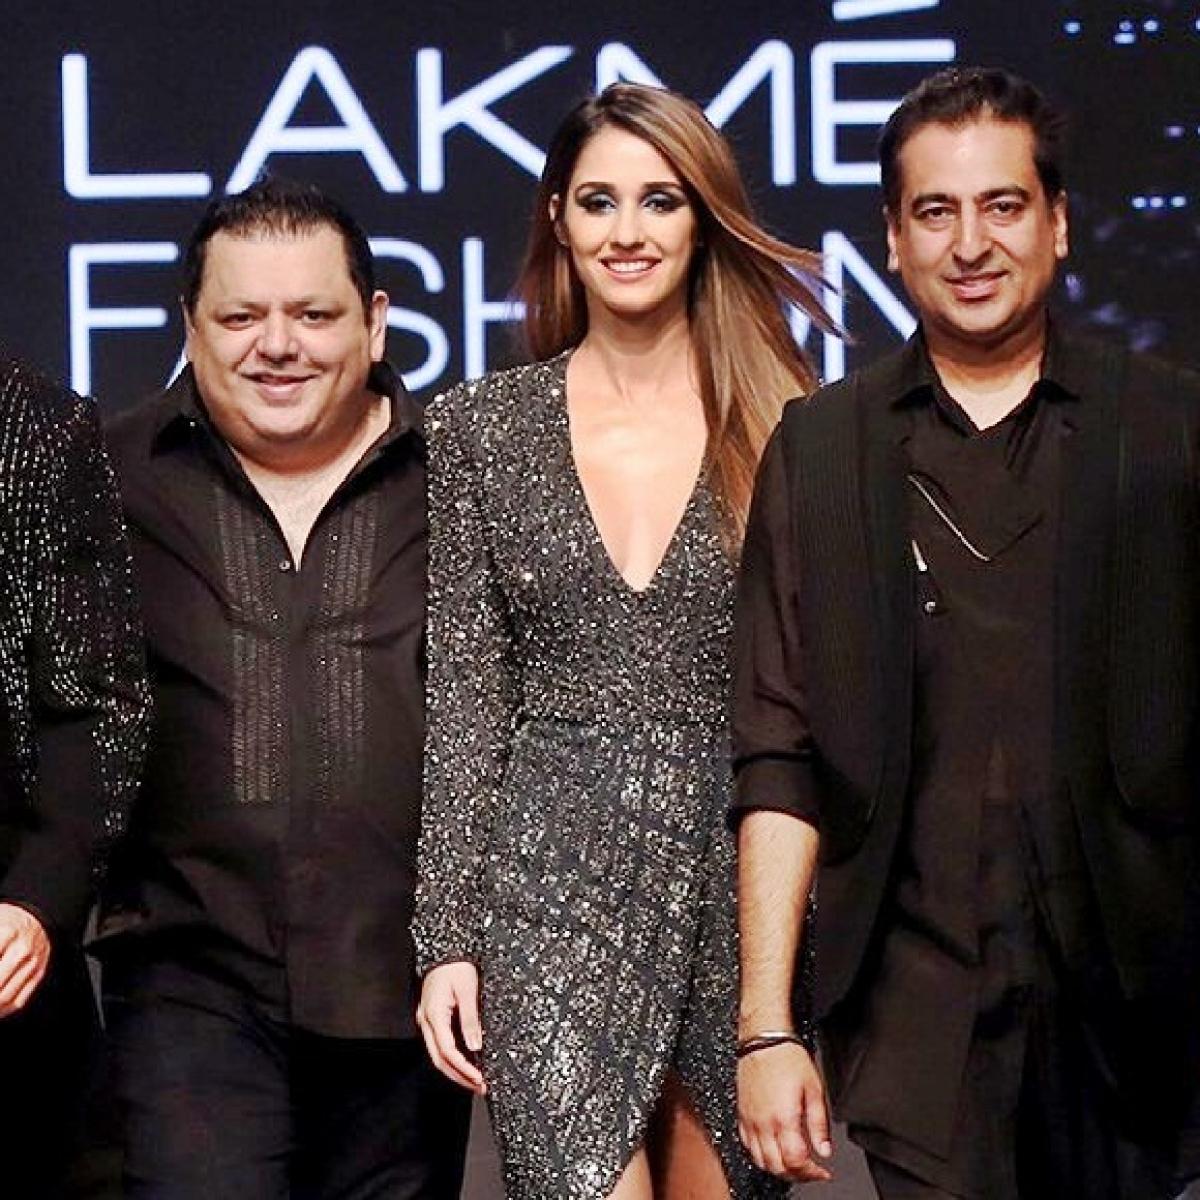 Ayushmann Khurrana, Disha Patani set the ramp ablaze as showstoppers at Lakme Fashion Week